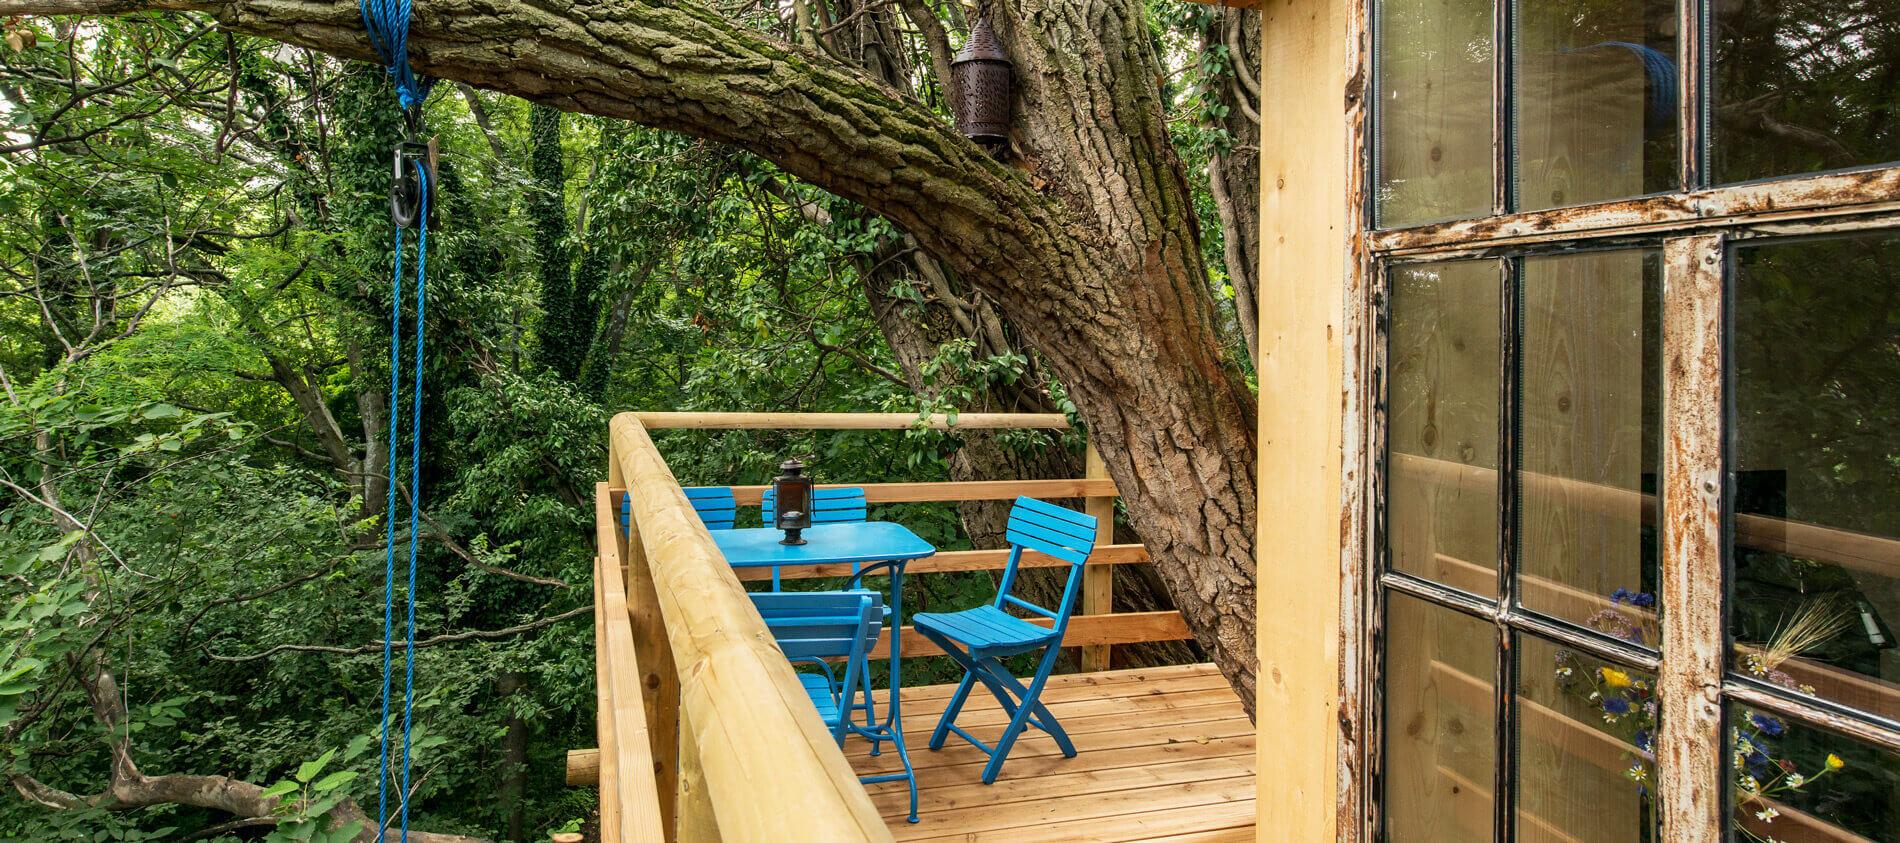 Baumhaus, Treehouse